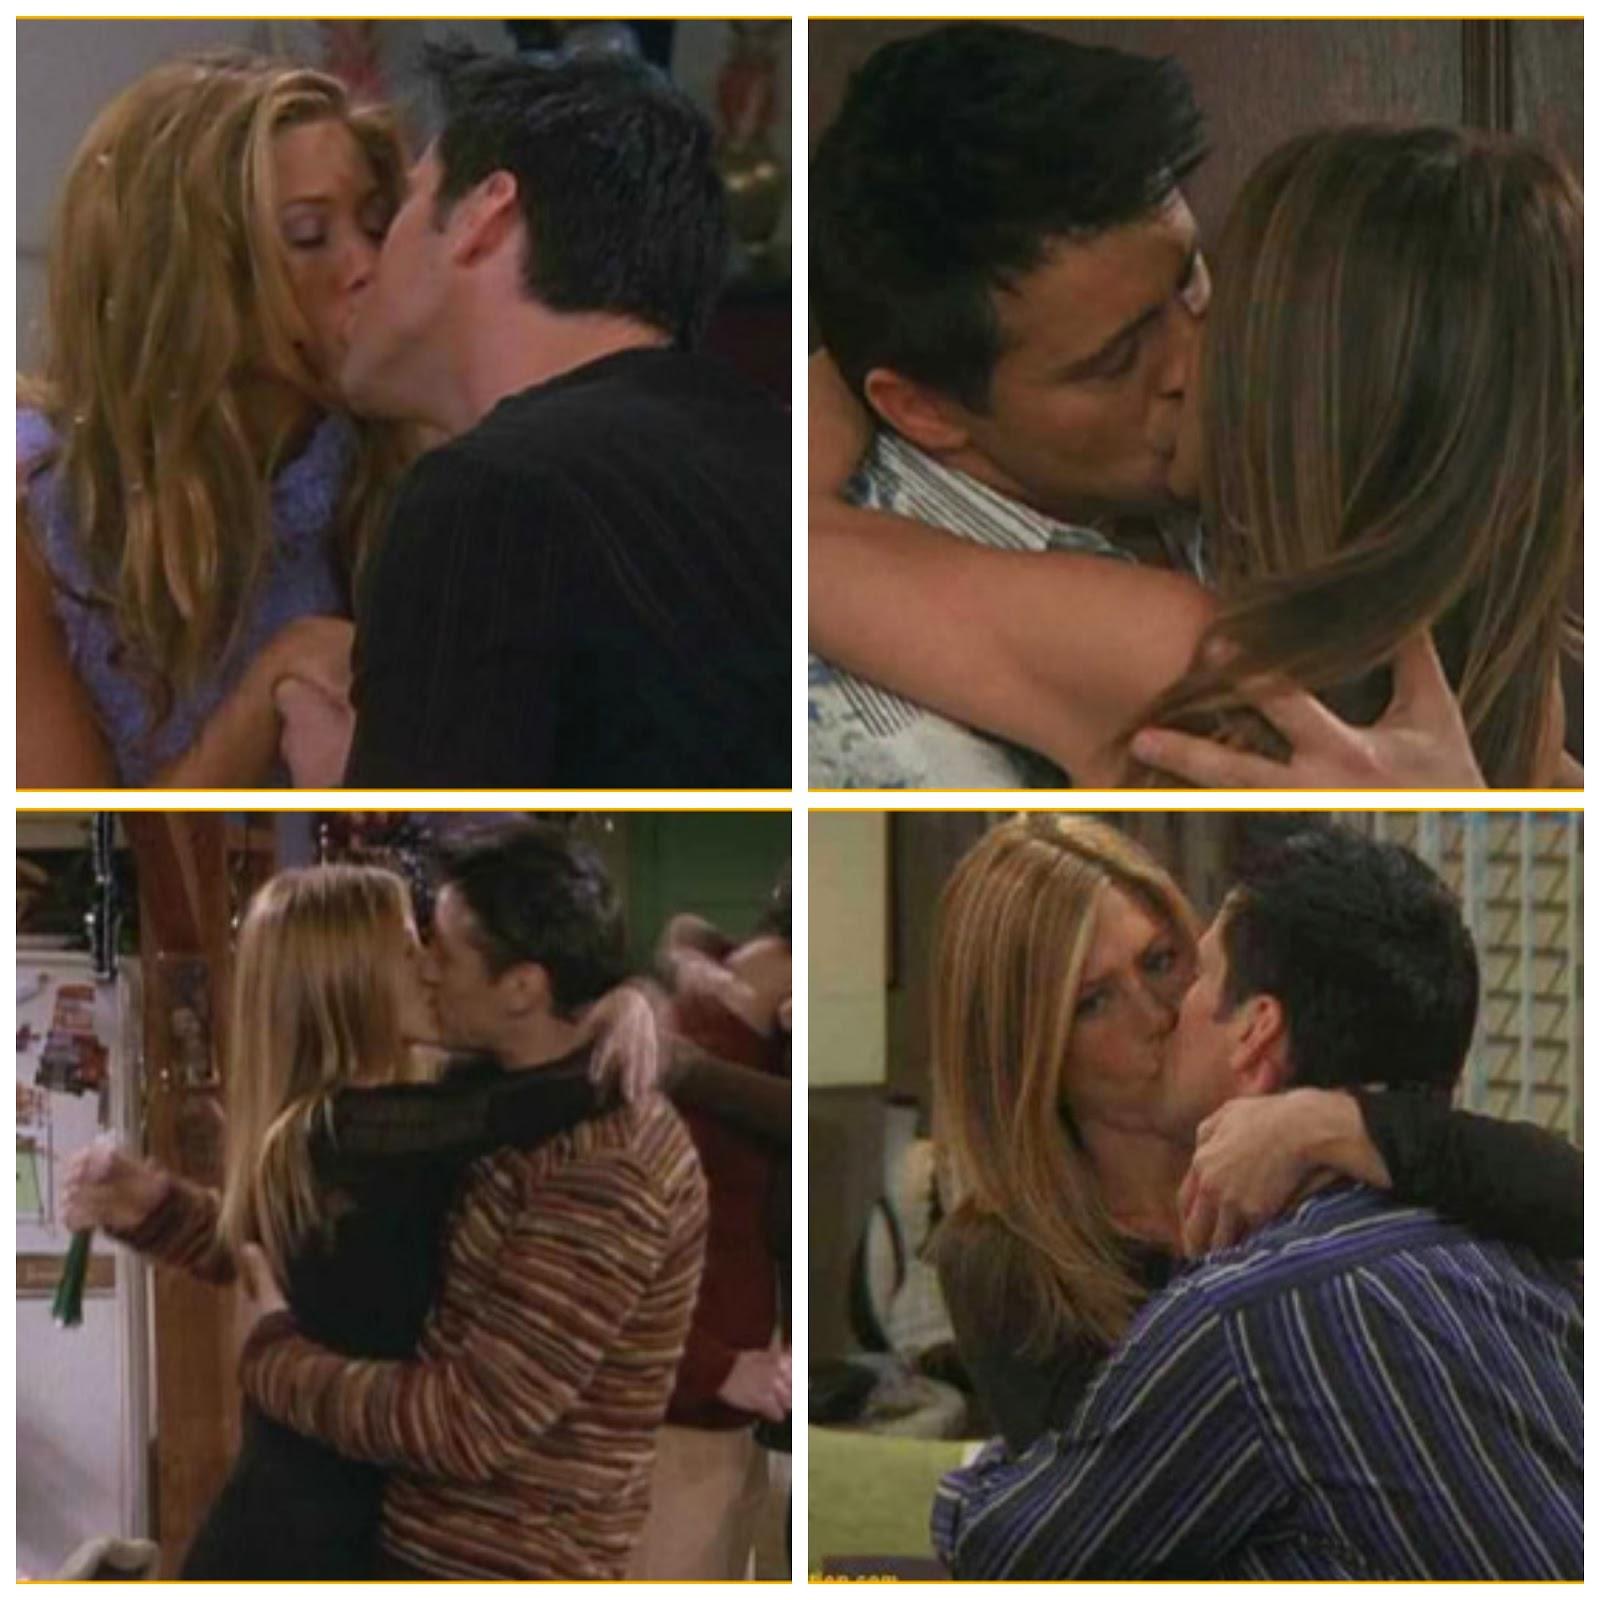 Besos de Joey y Rachel de la serie Friends